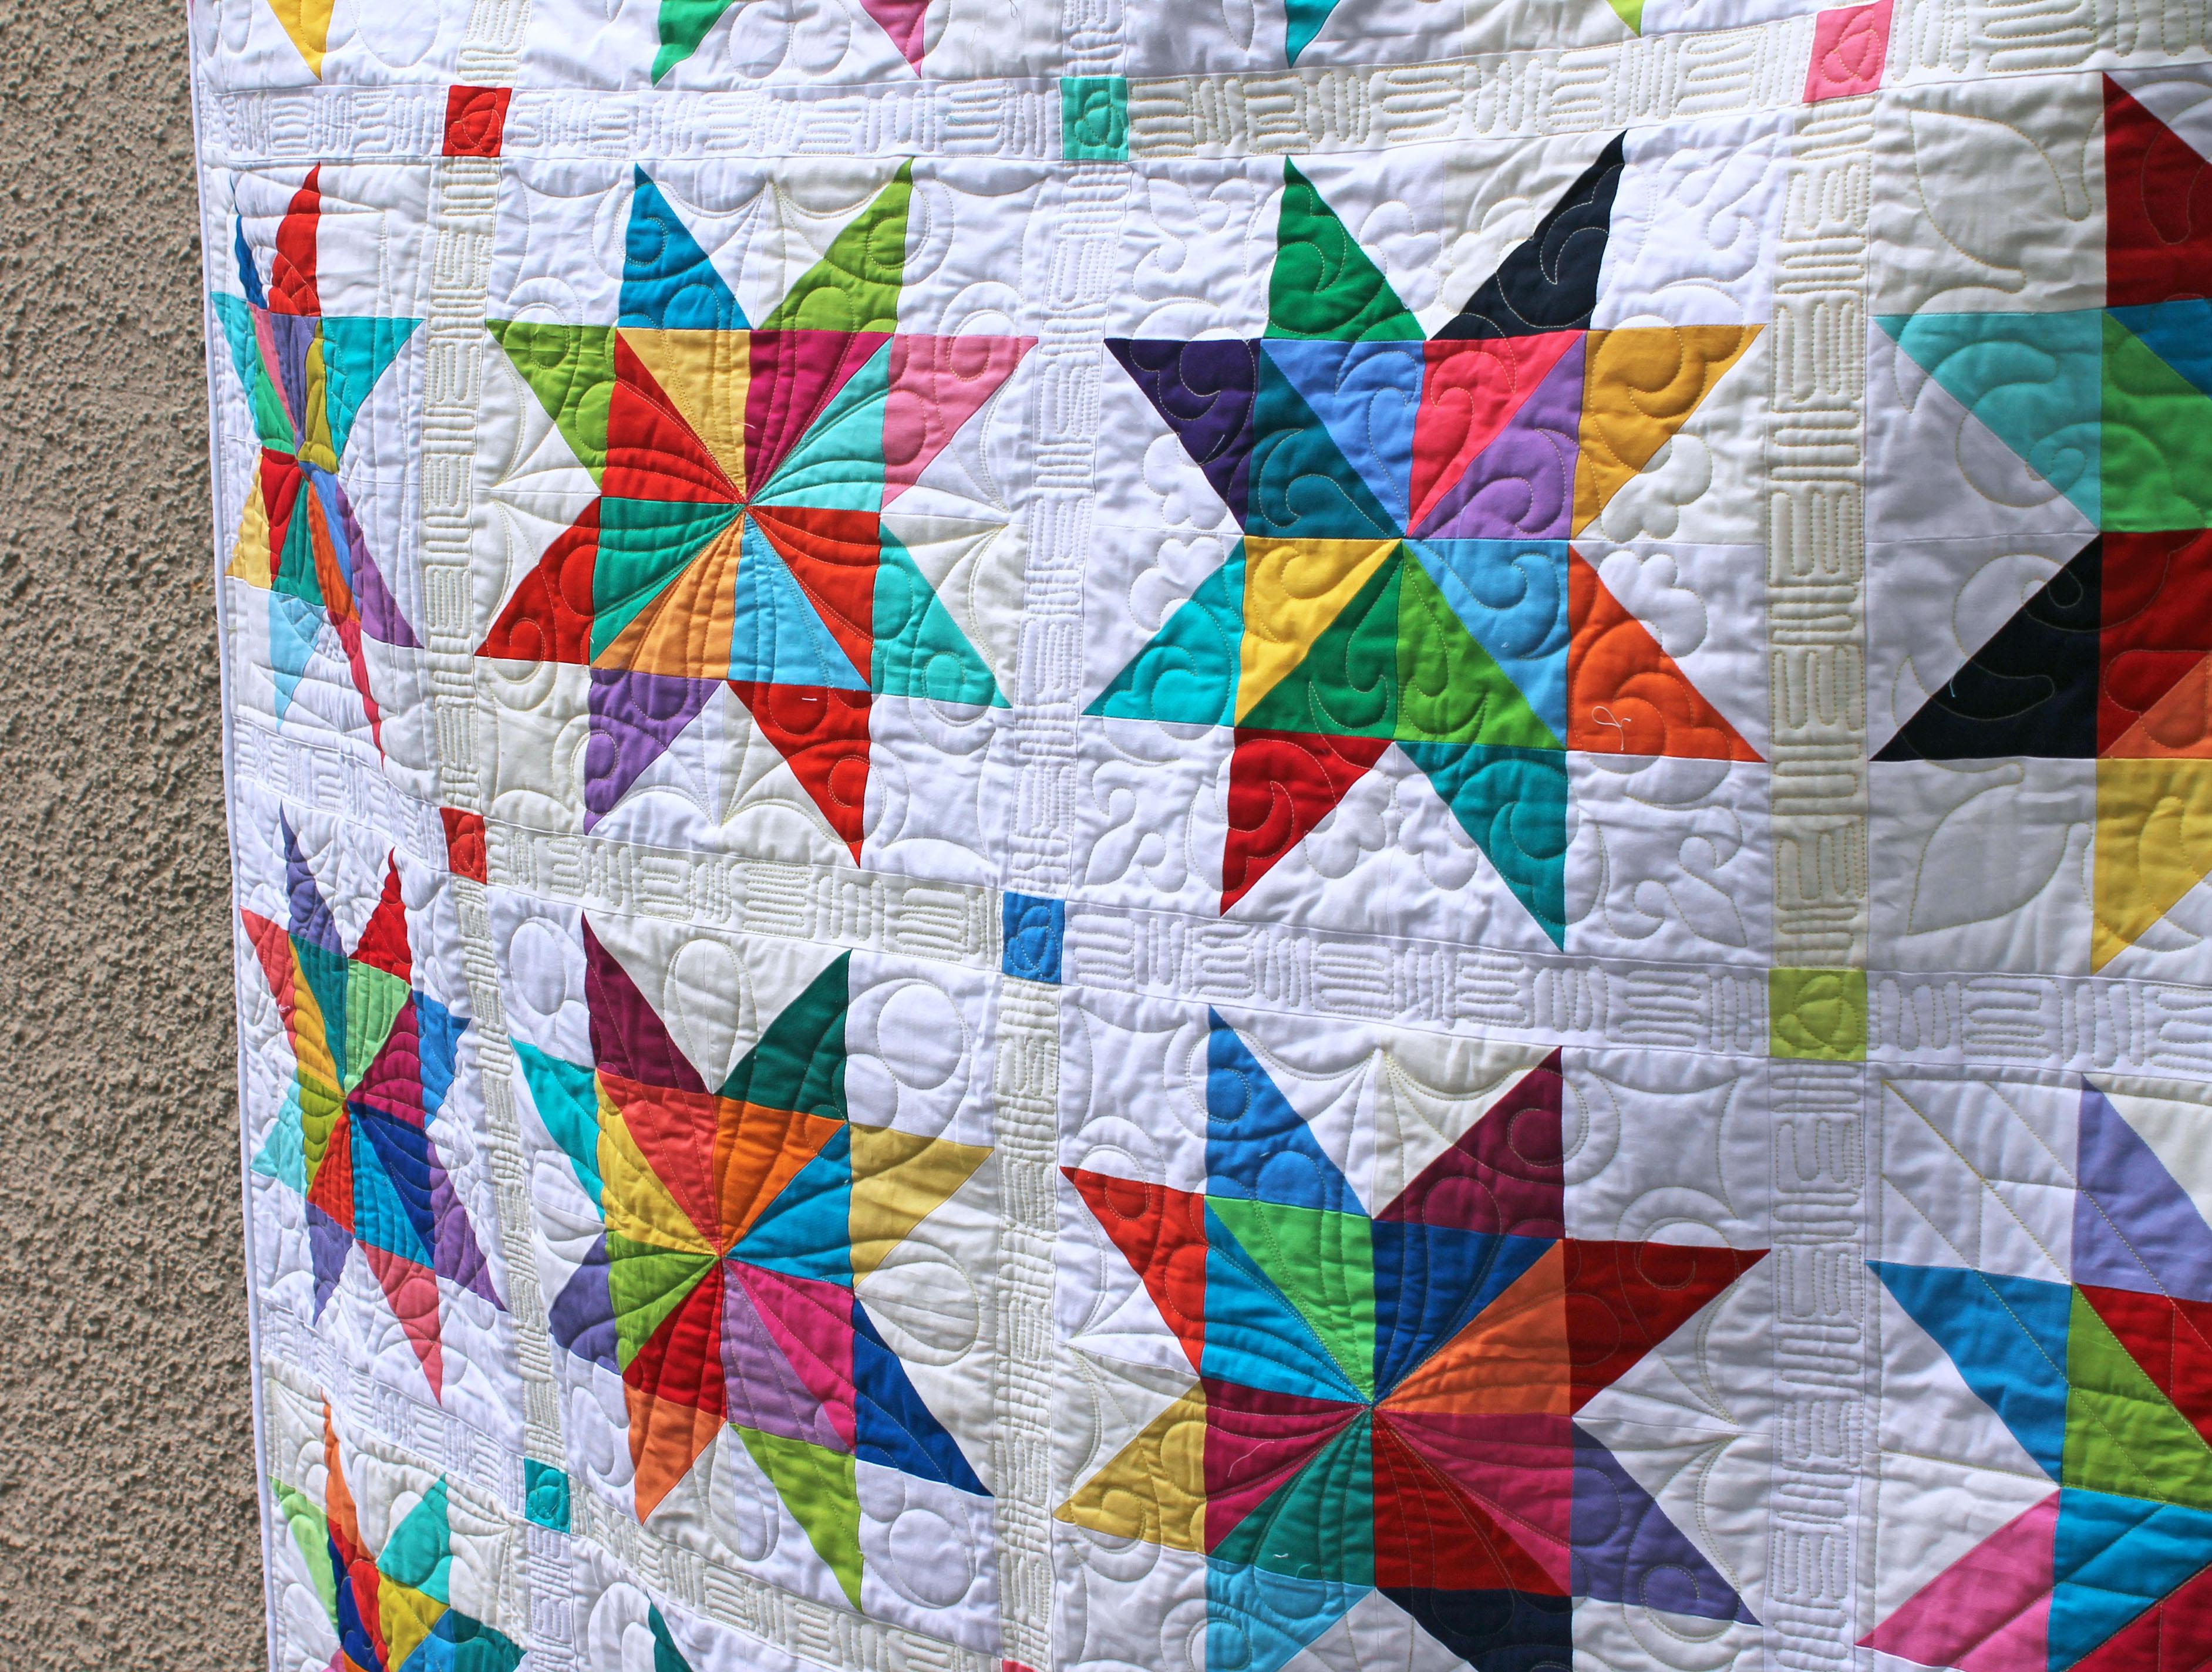 quilt detail 2